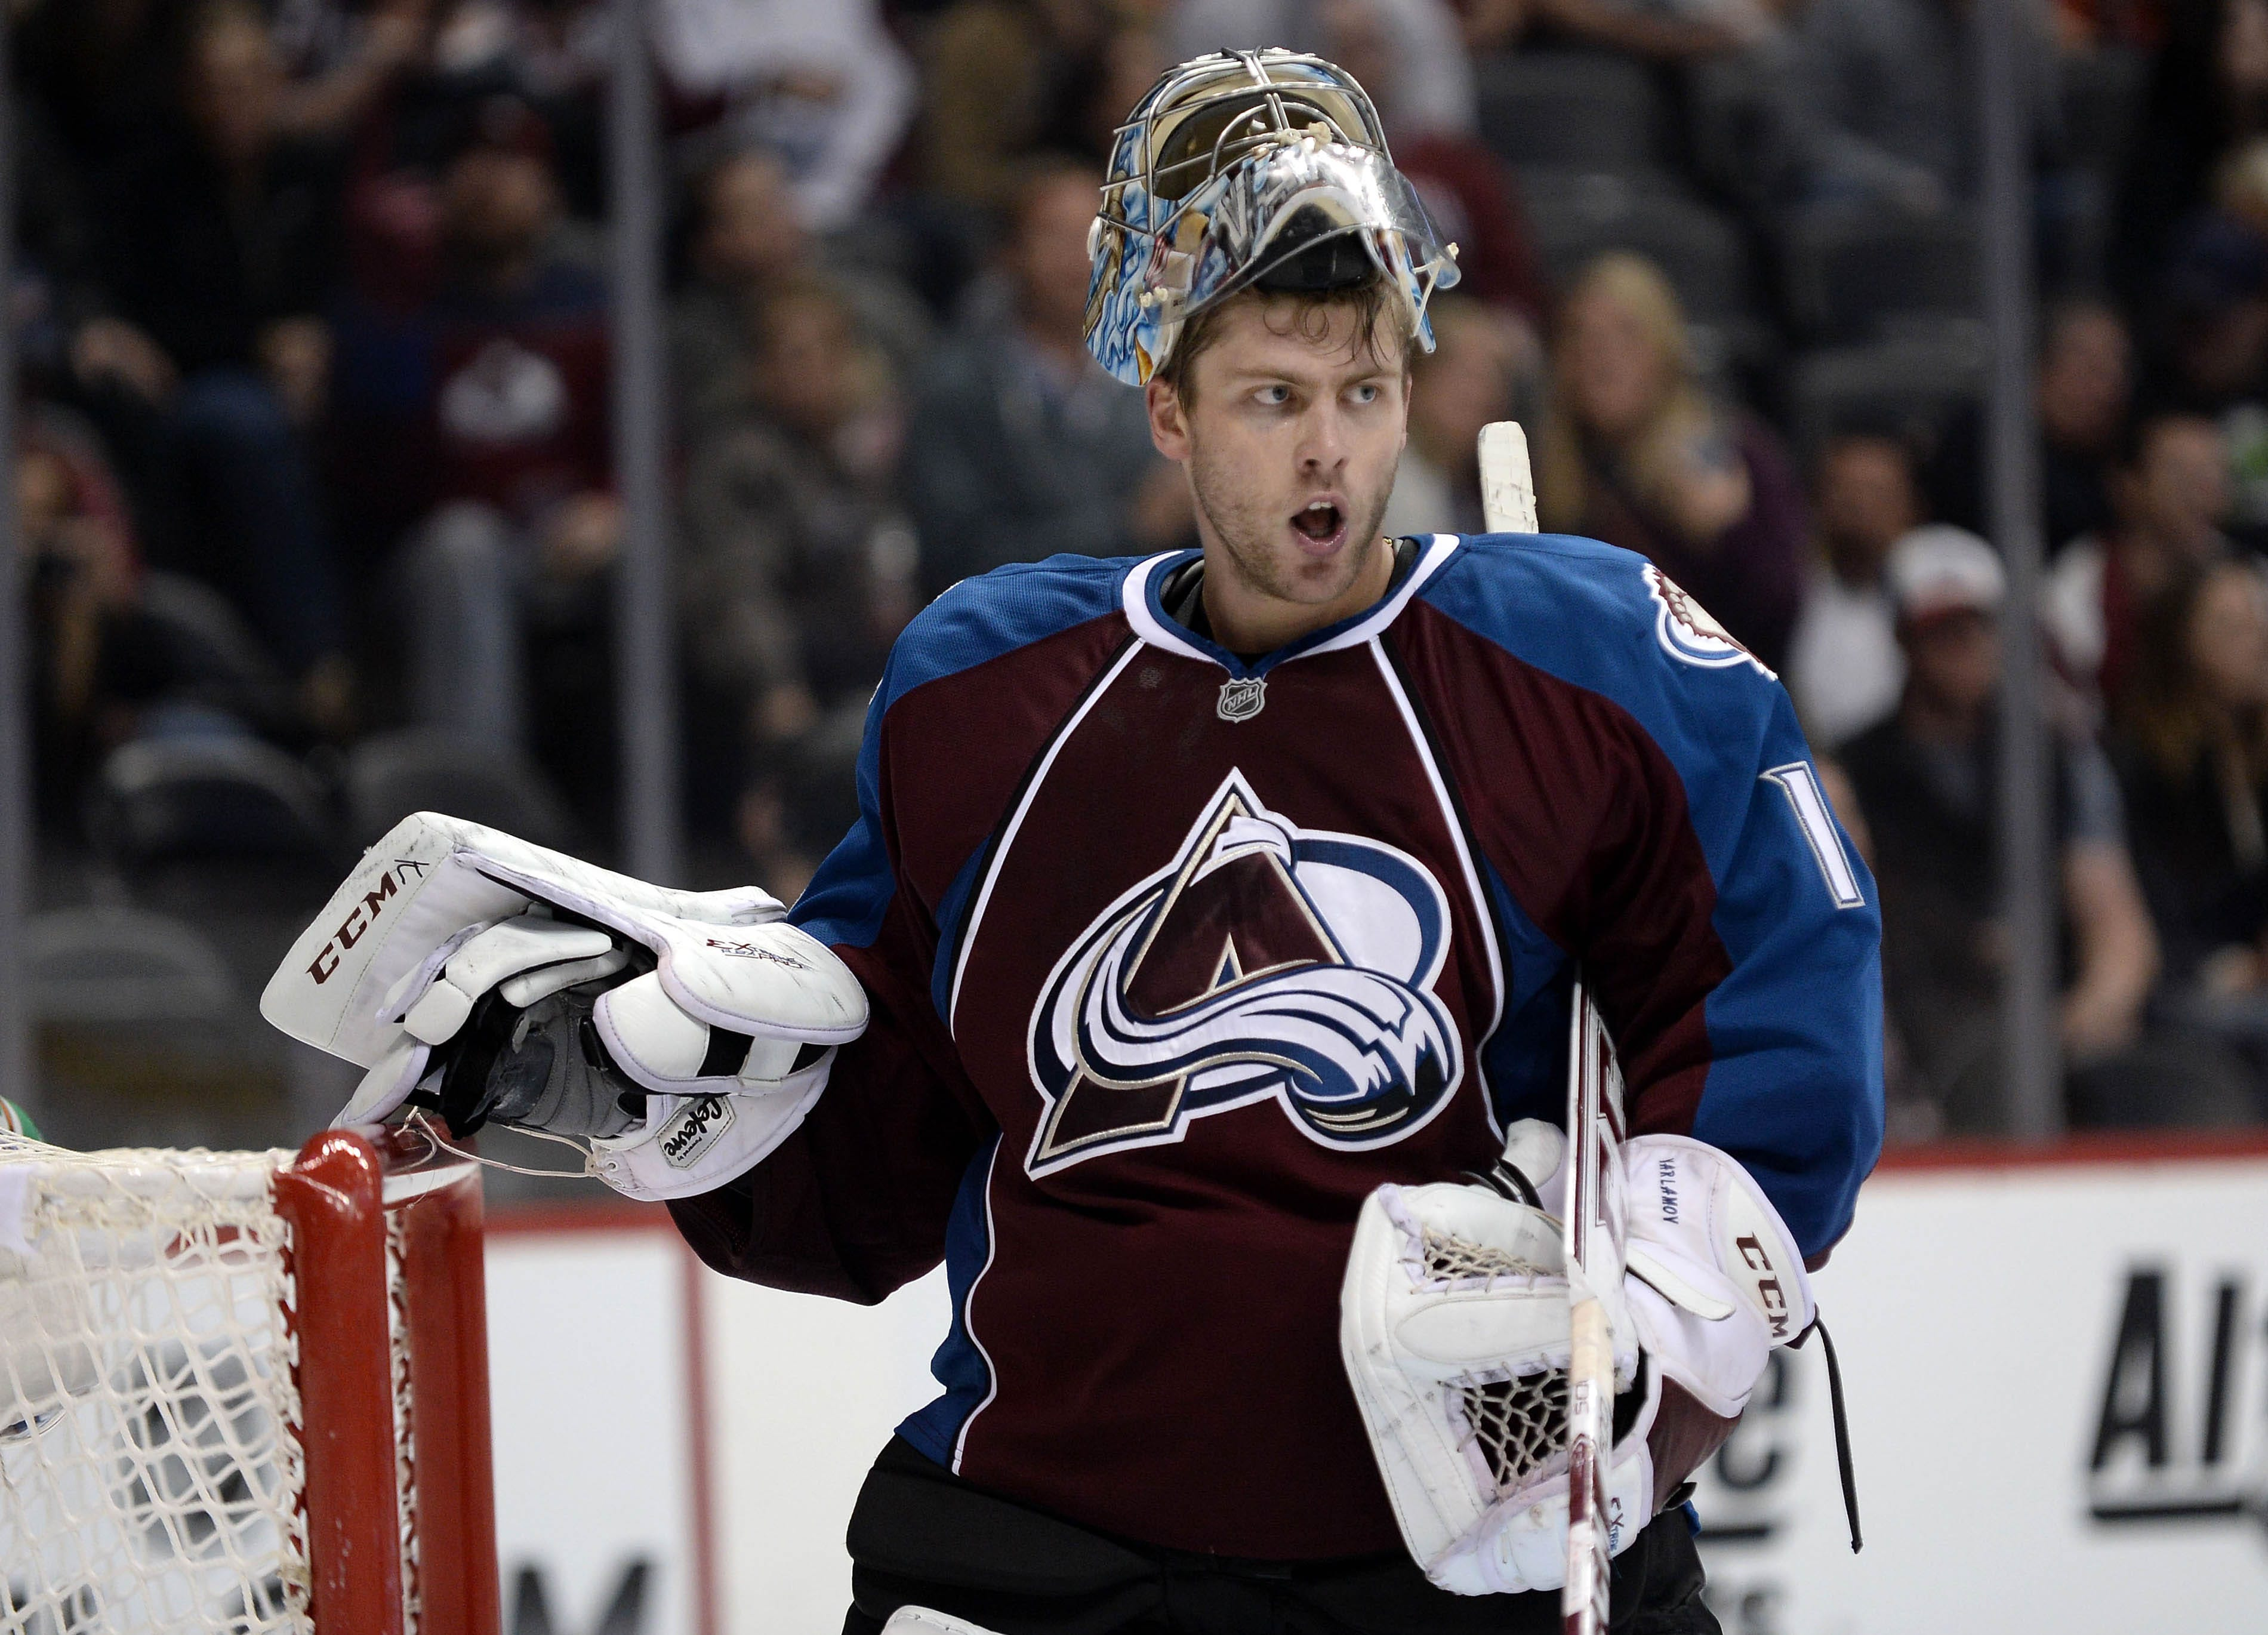 Arrest and indictment of Semen Varlamov 56